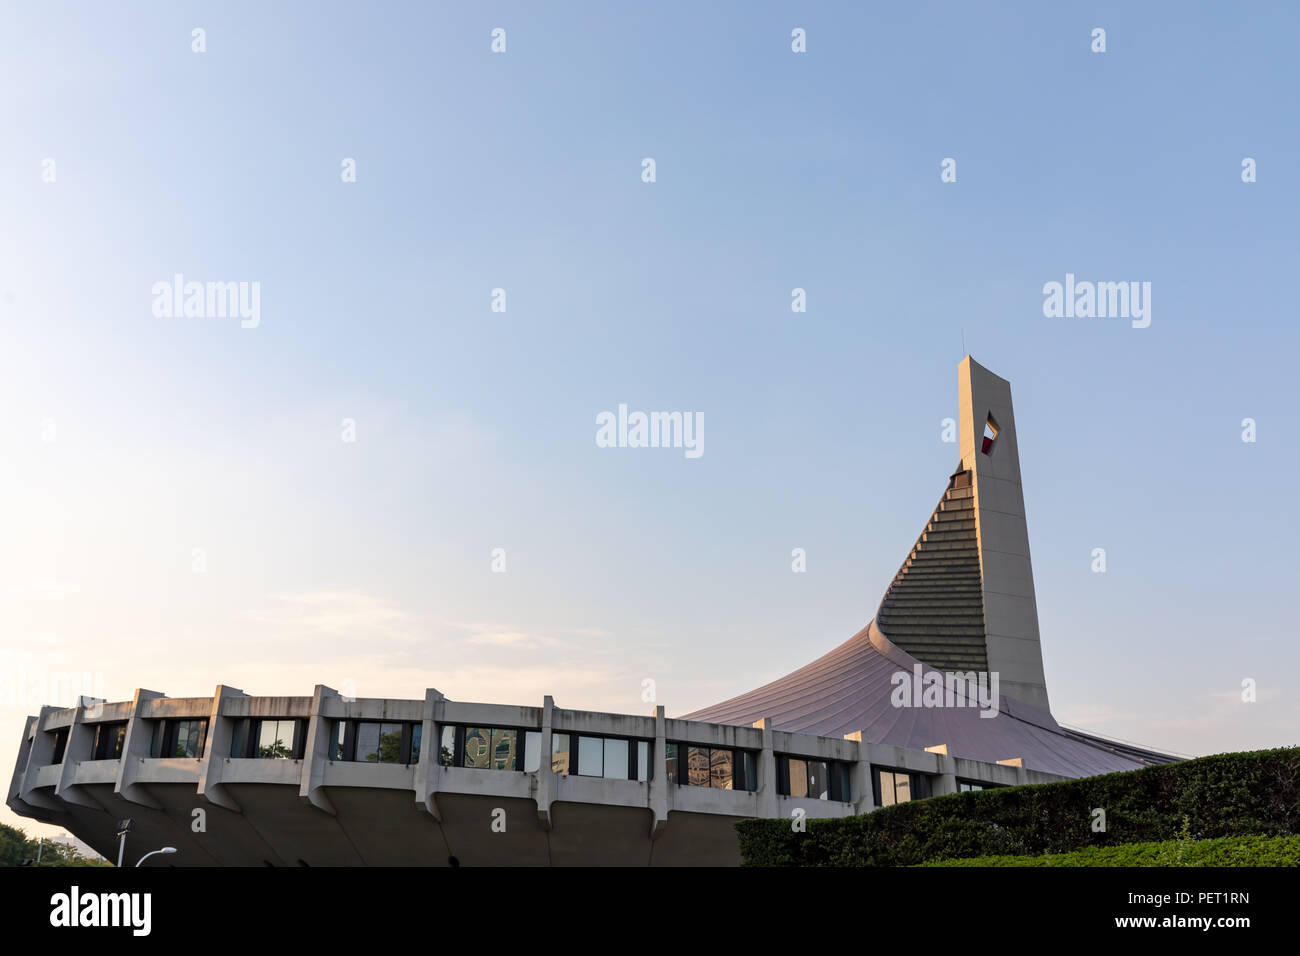 Yoyogi National Stadium (Kenzo Tange), built for the 1964 Summer Olympics in Tokyo, Japan Stock Photo